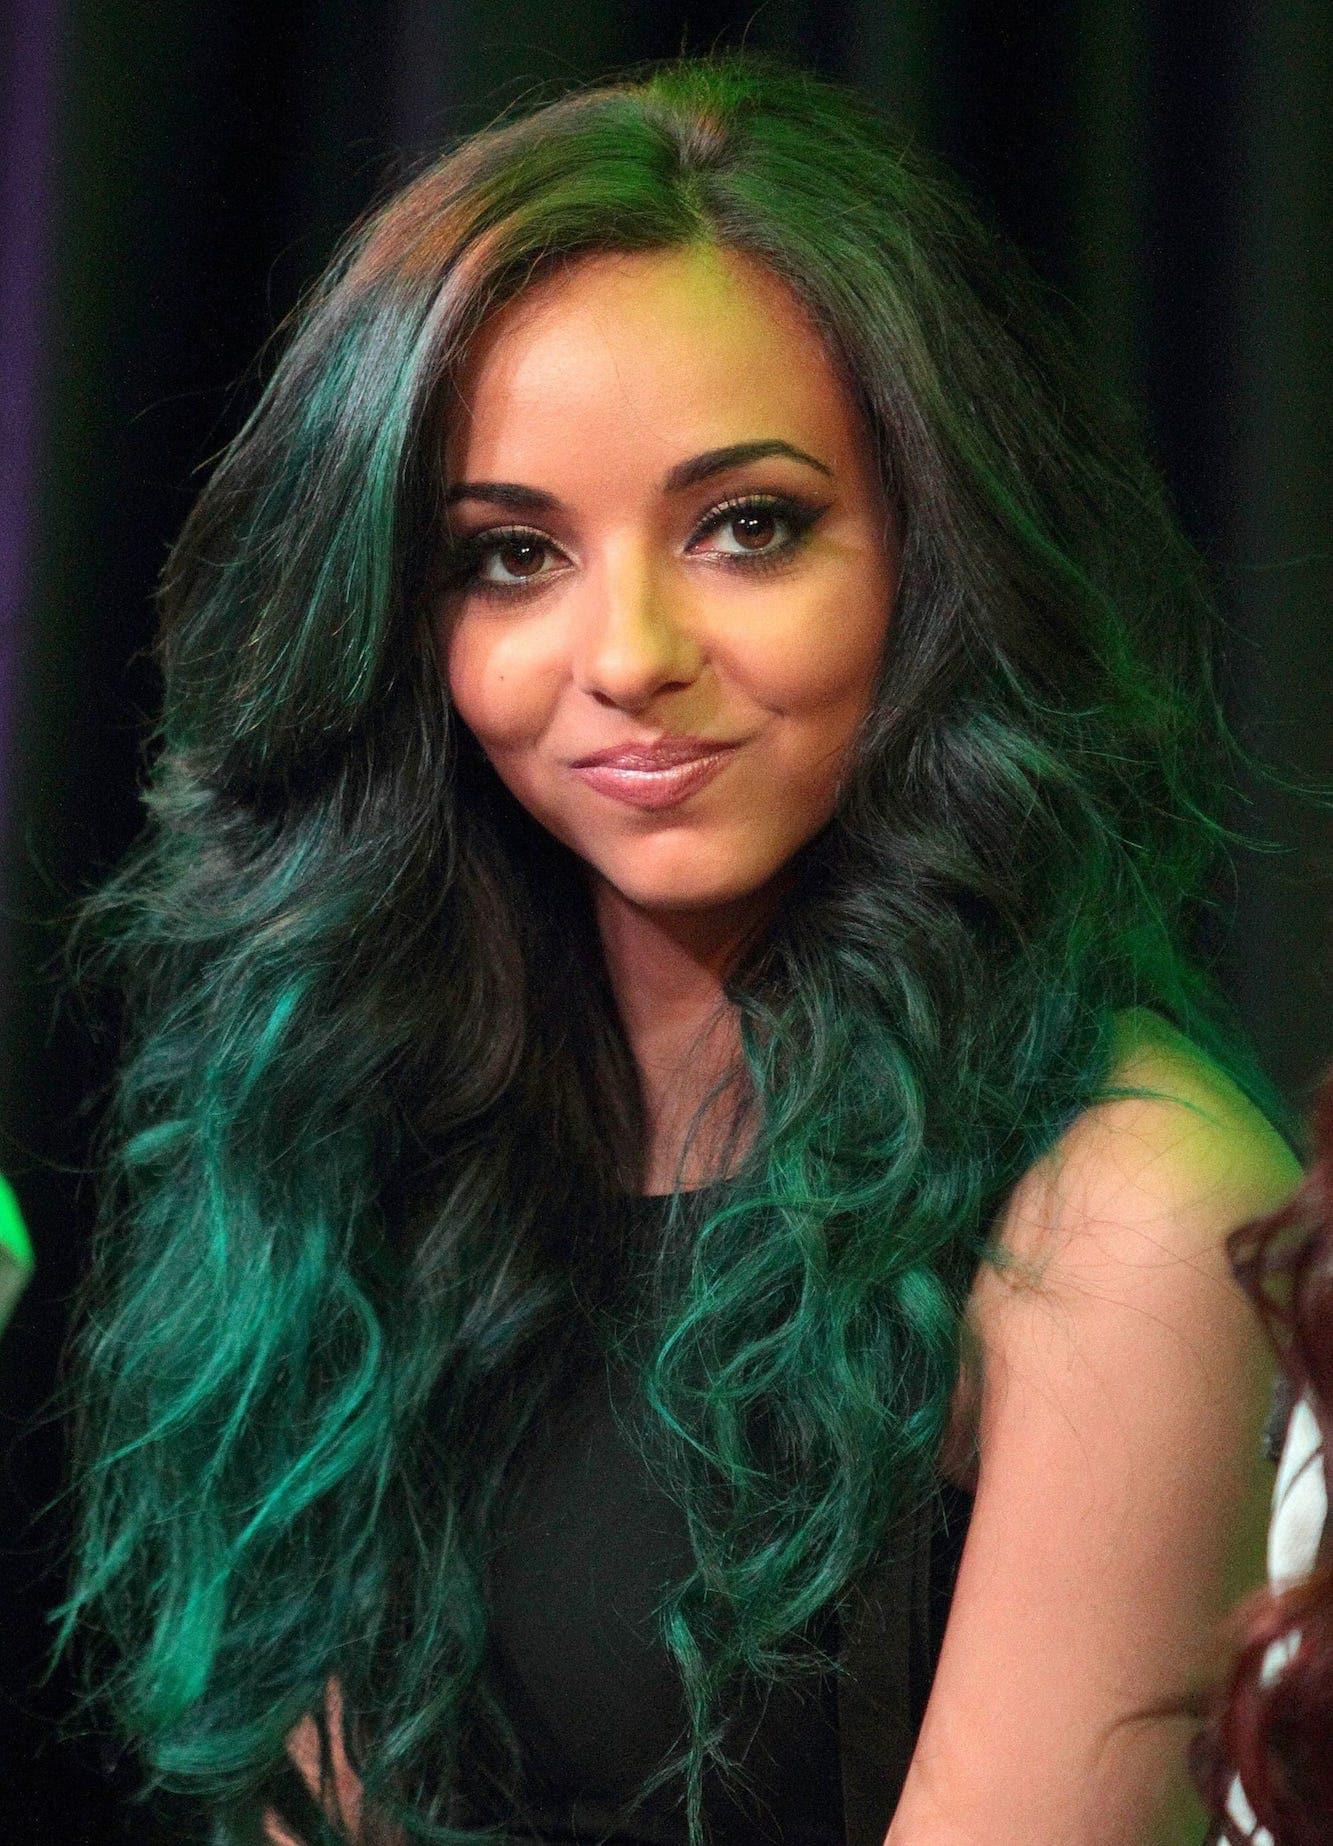 2 jade thirlwall dengan model rambut keriting panjang warna hijau gelap